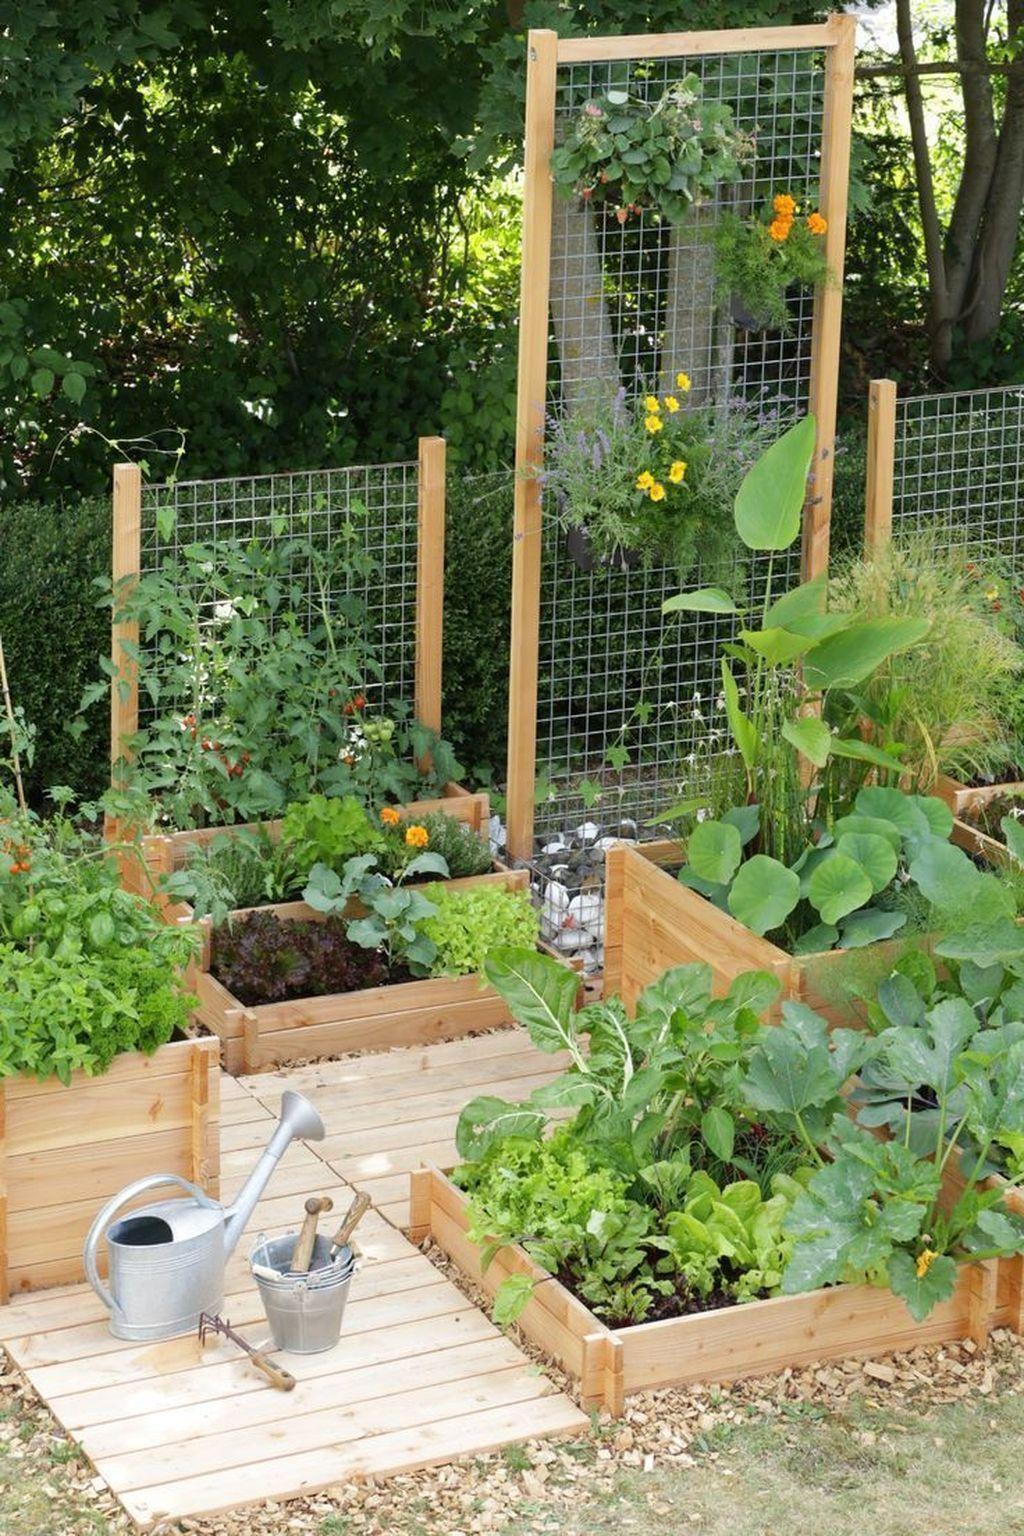 Pin By Cheryl N On Garden Backyard Vegetable Gardens Vegetable Garden Design Small Gardens Outdoor kitchen garden ideas